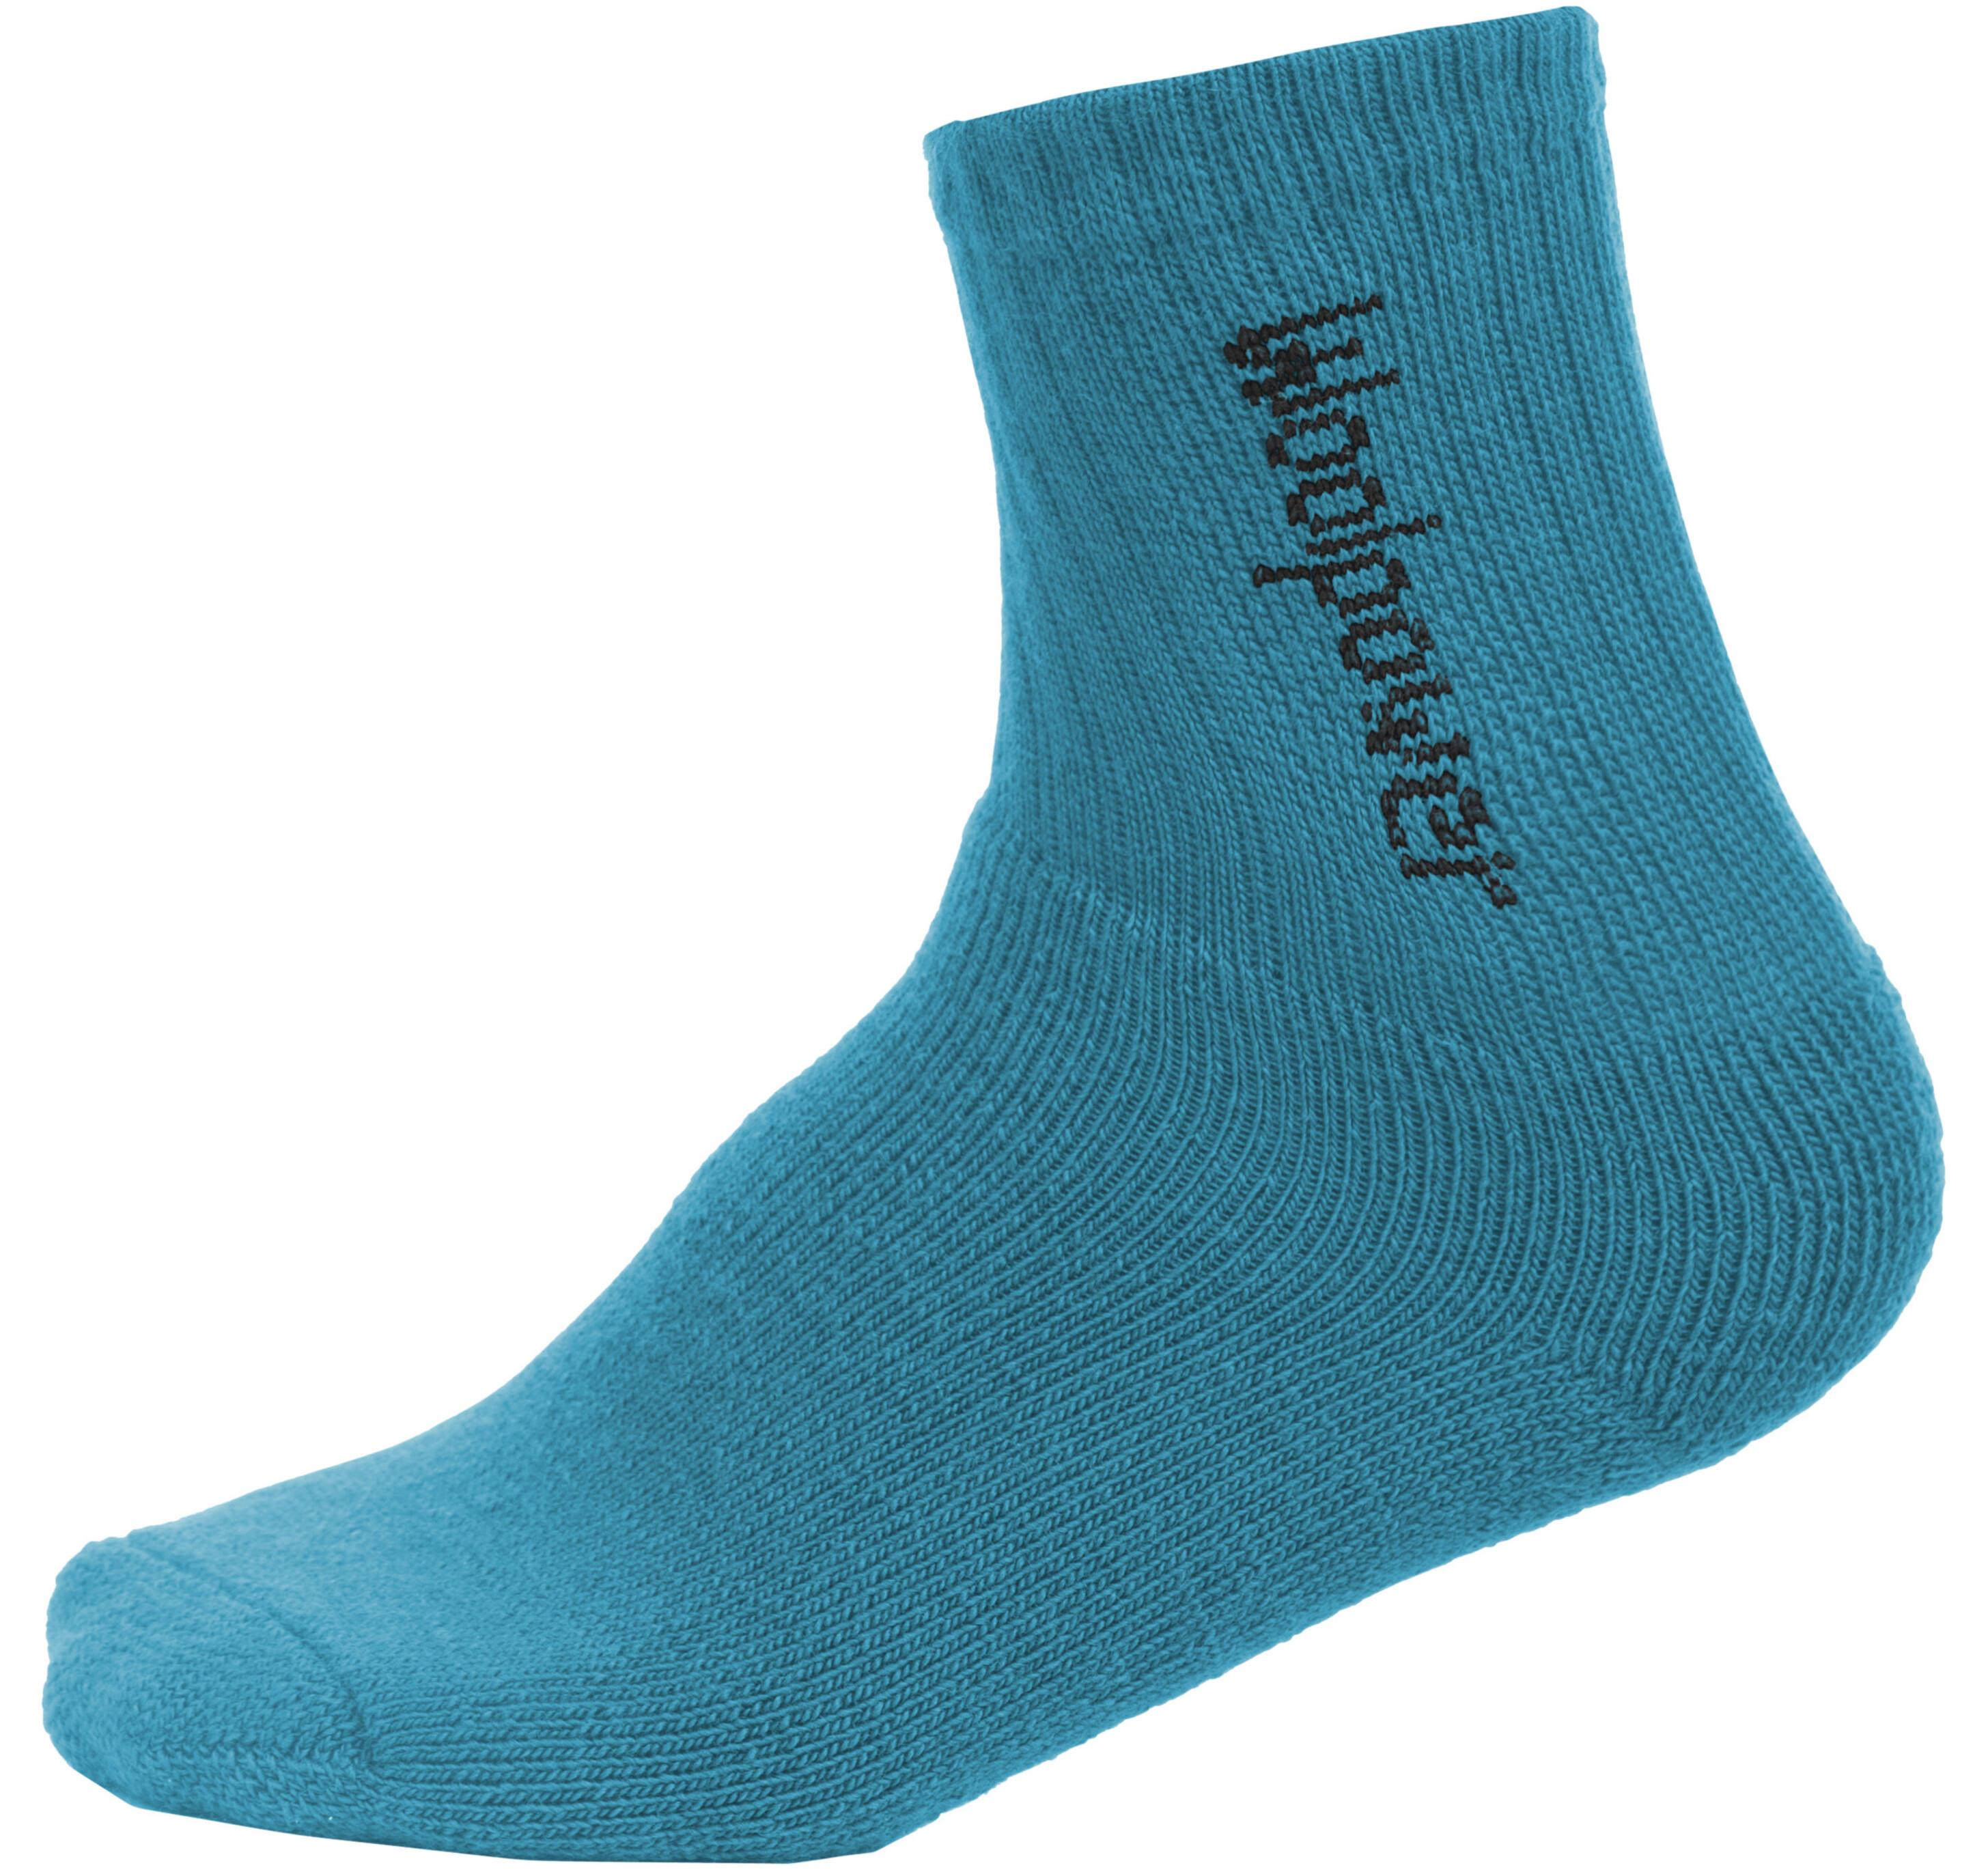 Woolpower 400 Classic Logo Calze Bambino blu su Addnature 502e82a47cca